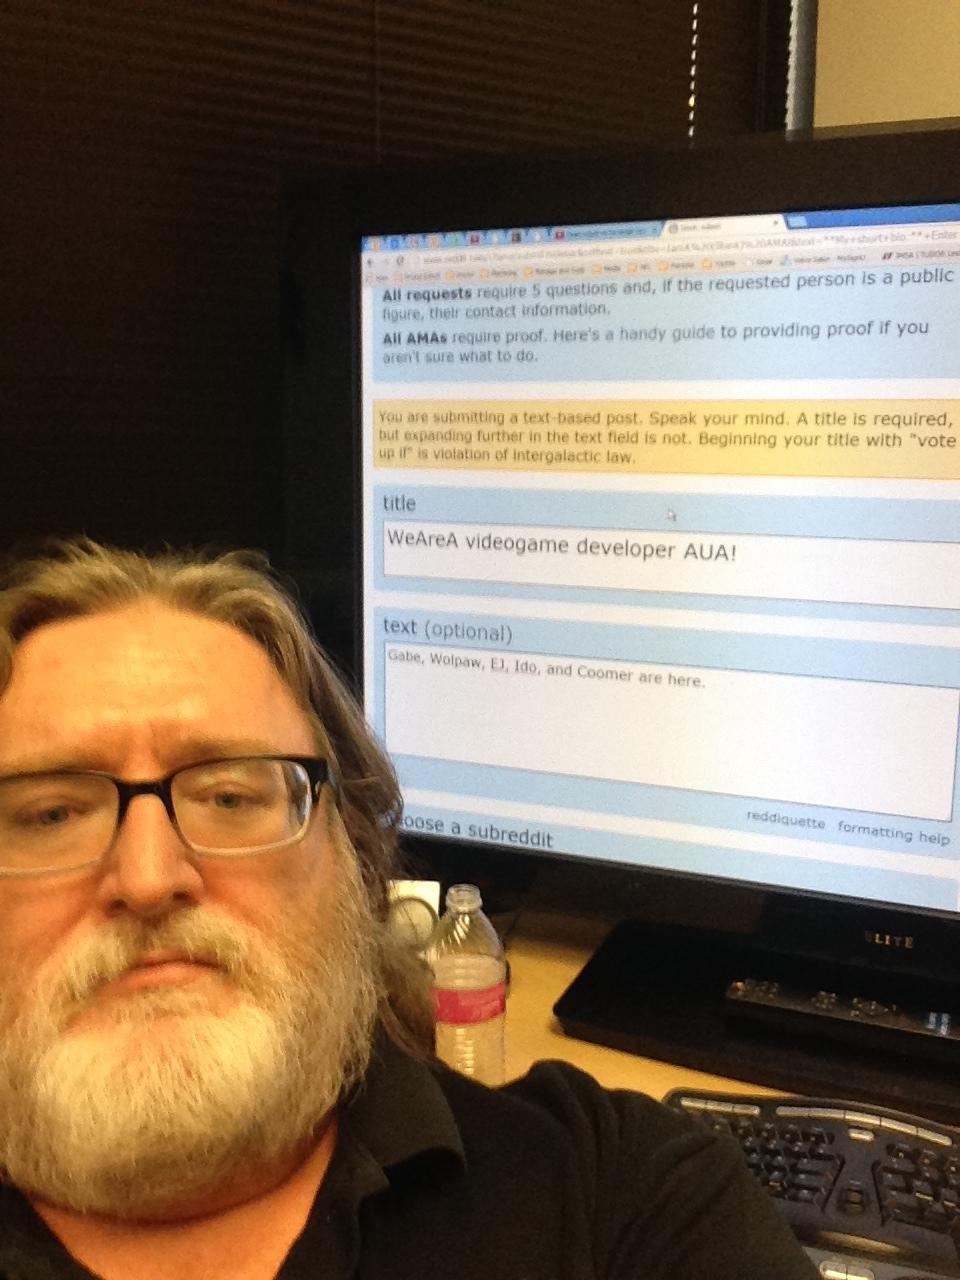 Gabe Newell Reddit Ama Selfie